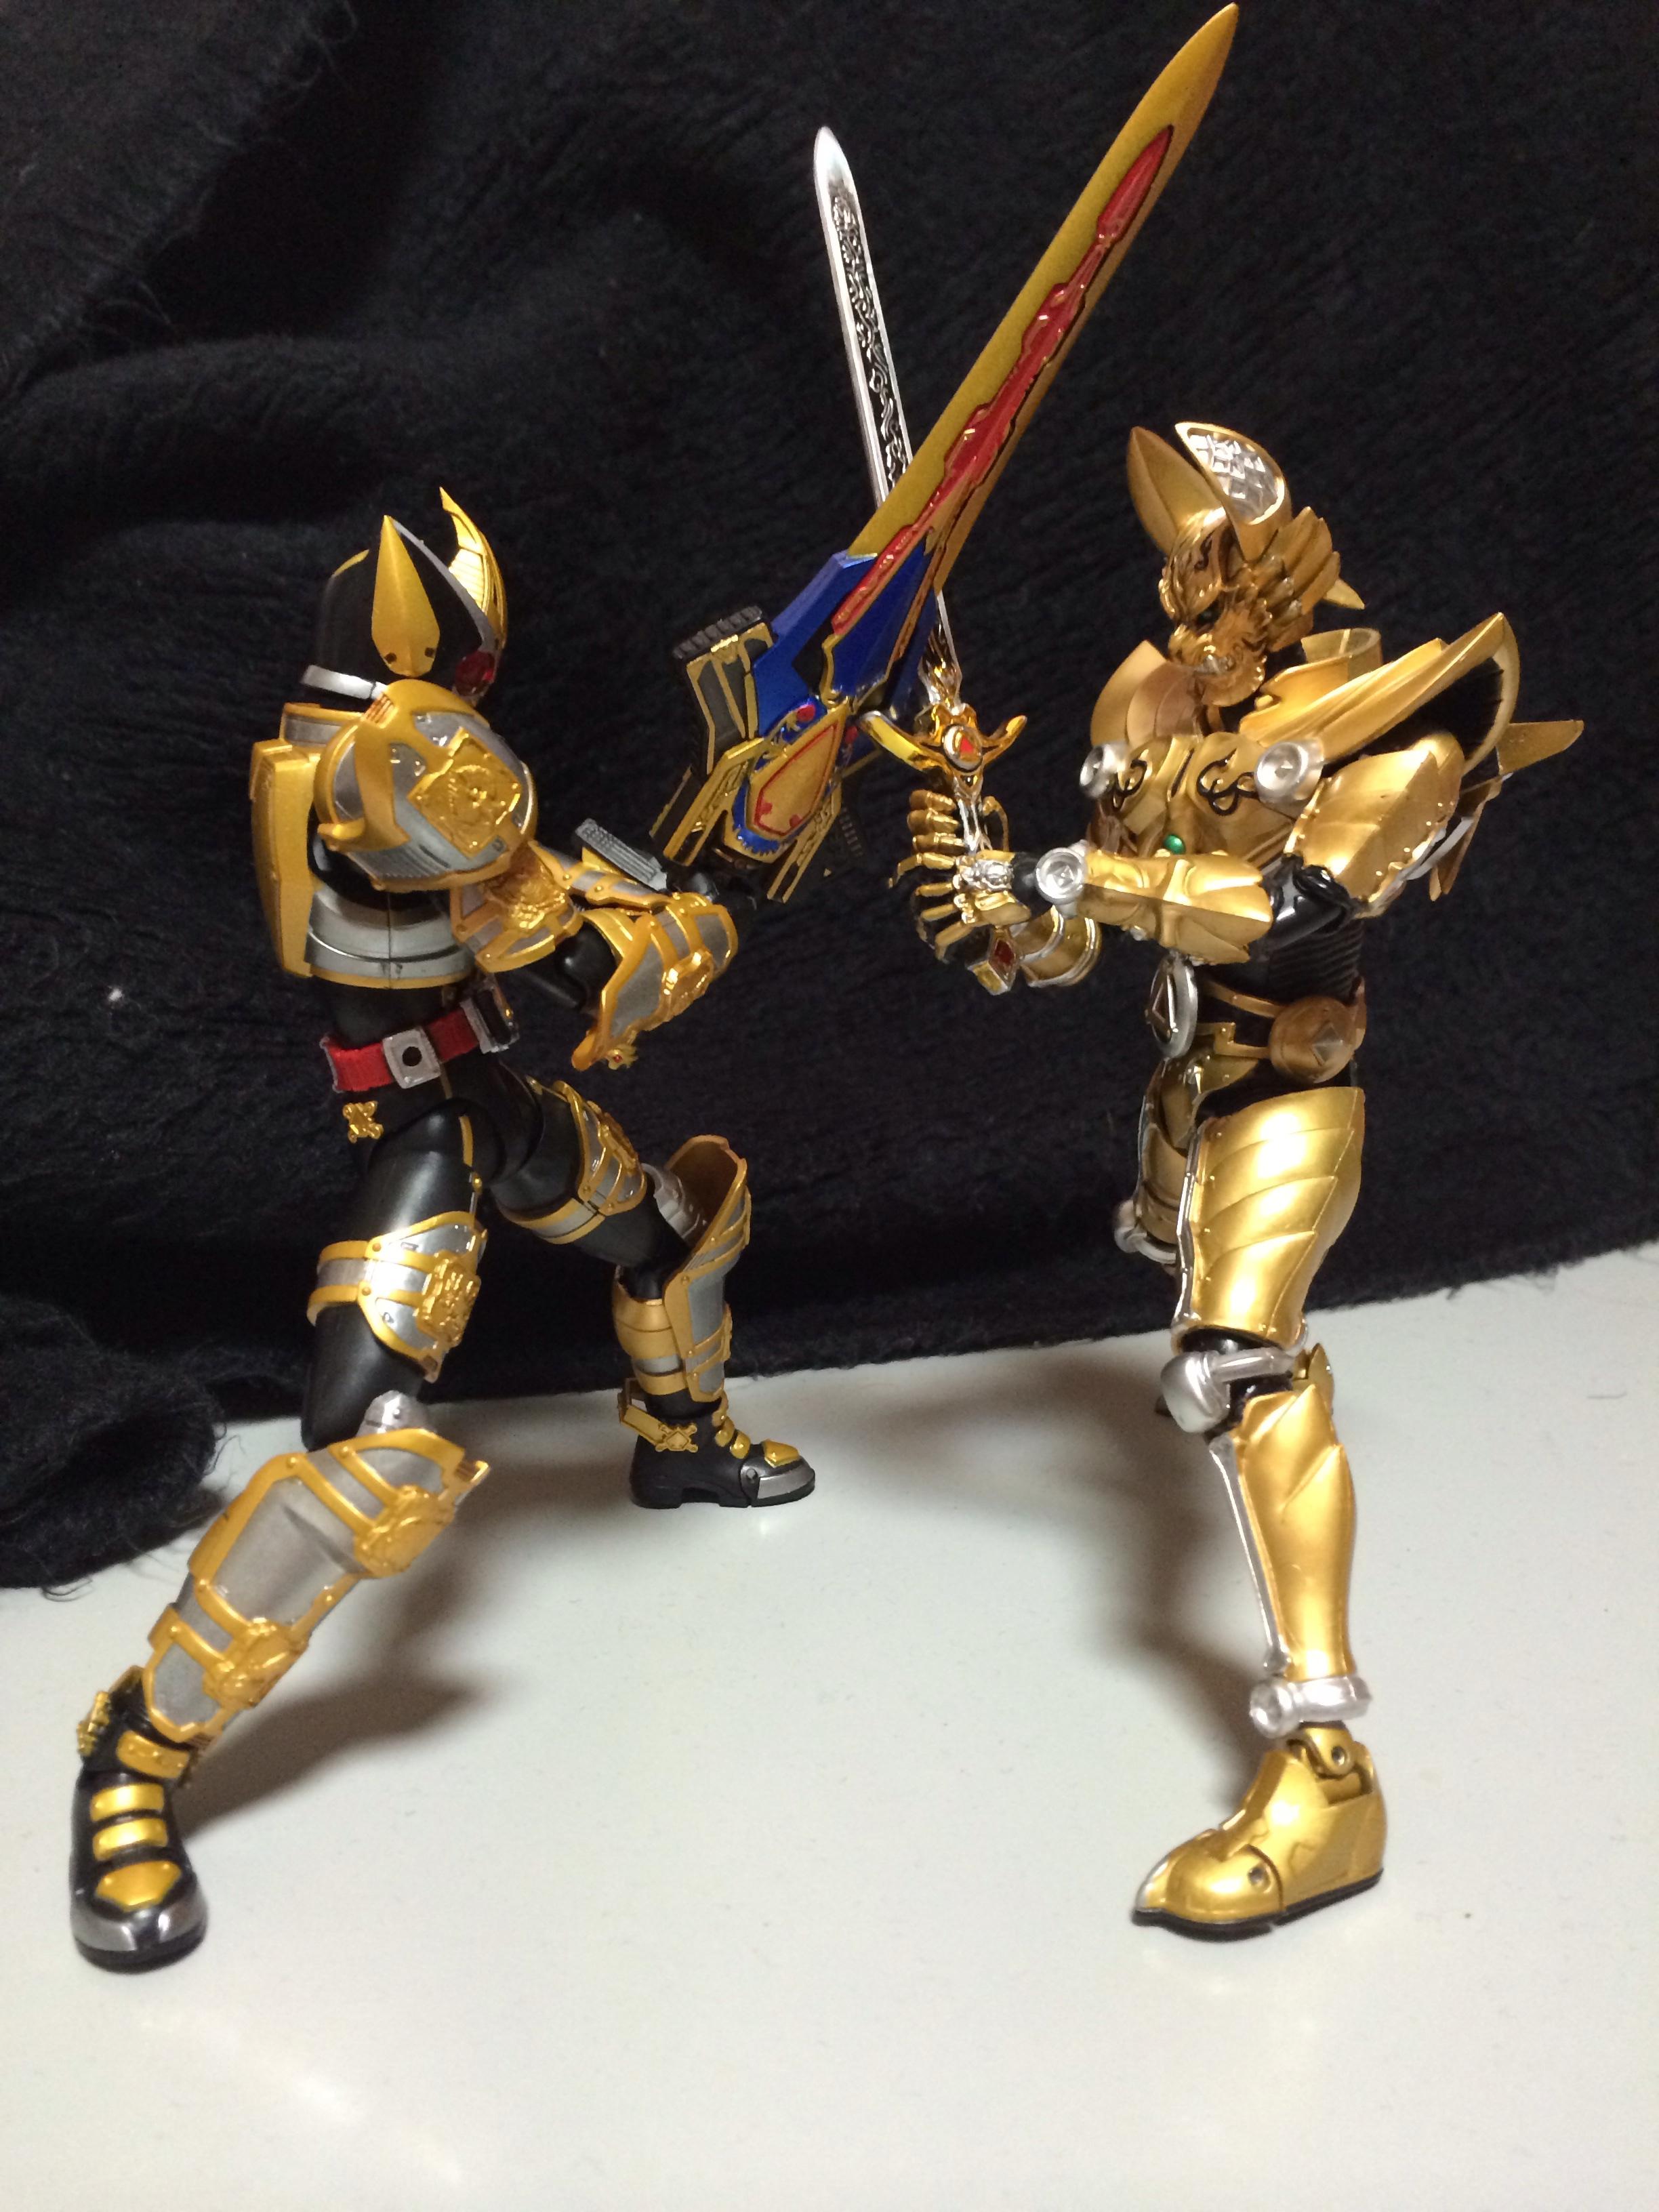 SH Figuarts Kamen Rider Blade King Form In Hand Images - Tokunation